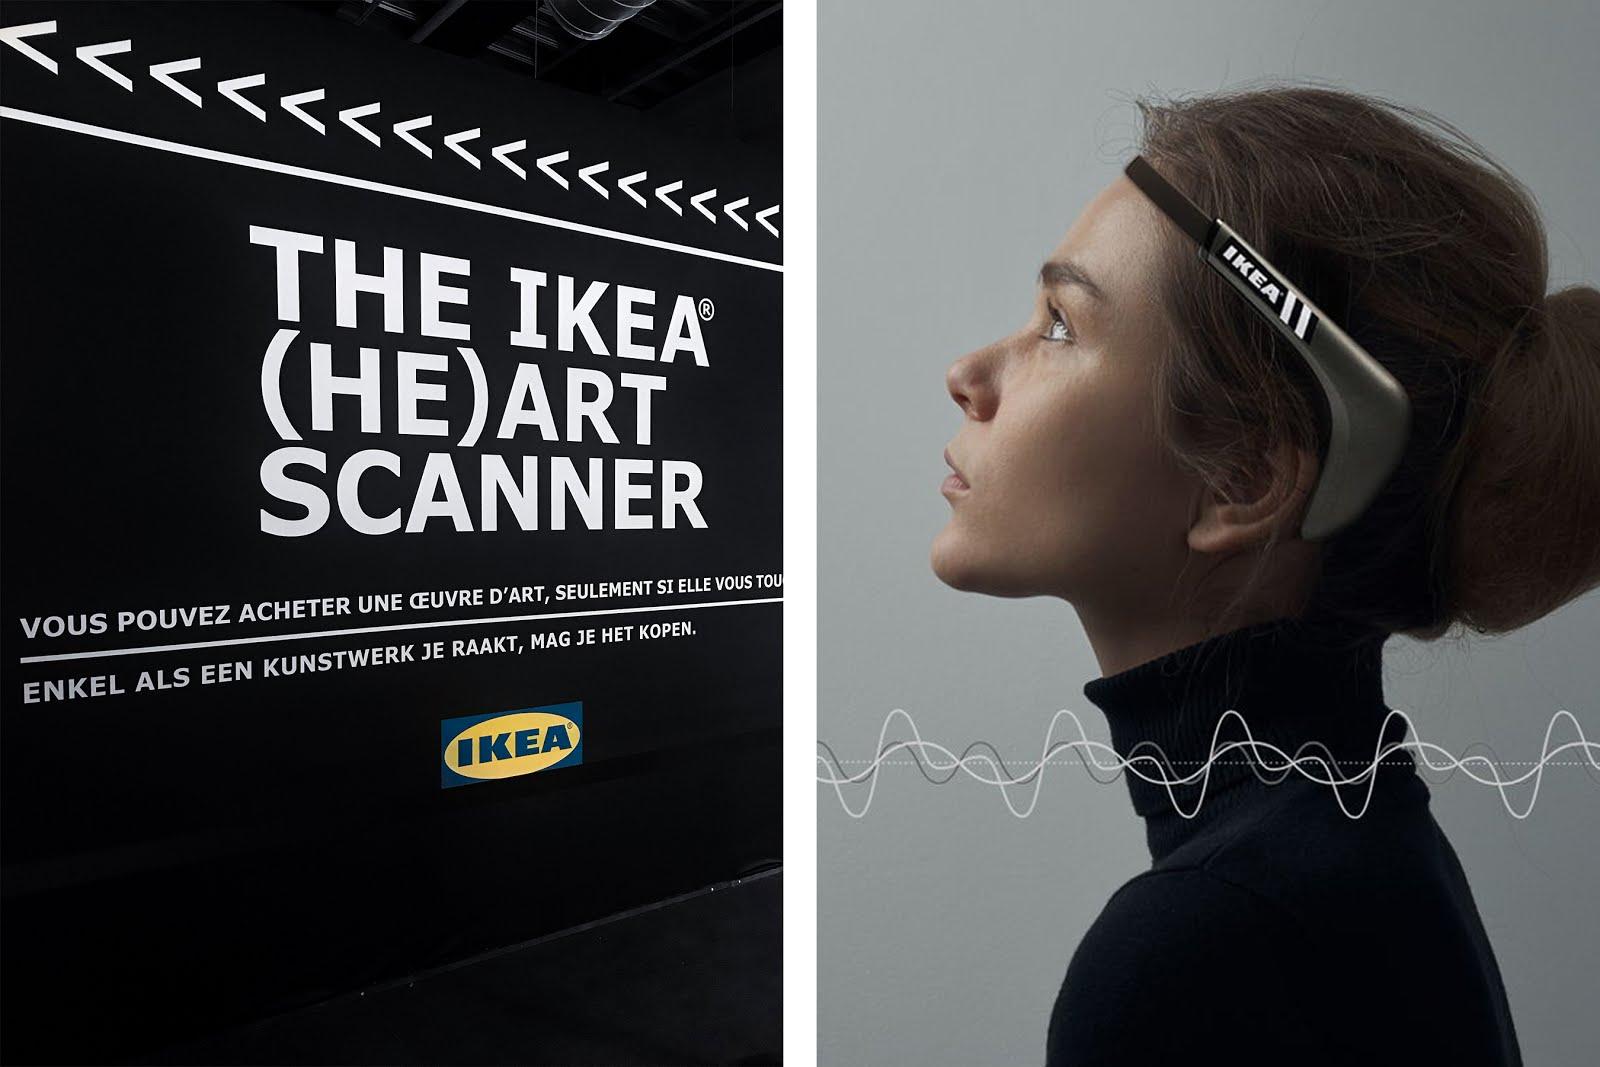 Ikea Art collection 2019, Virgil abloh, chiazzo, craig green, misaki kawai, seulgi lee, noah lyon, filip pagowski, carpet, tapijt, kunst, belgie, ikea anderlecht, hersenscanner, brain scanner